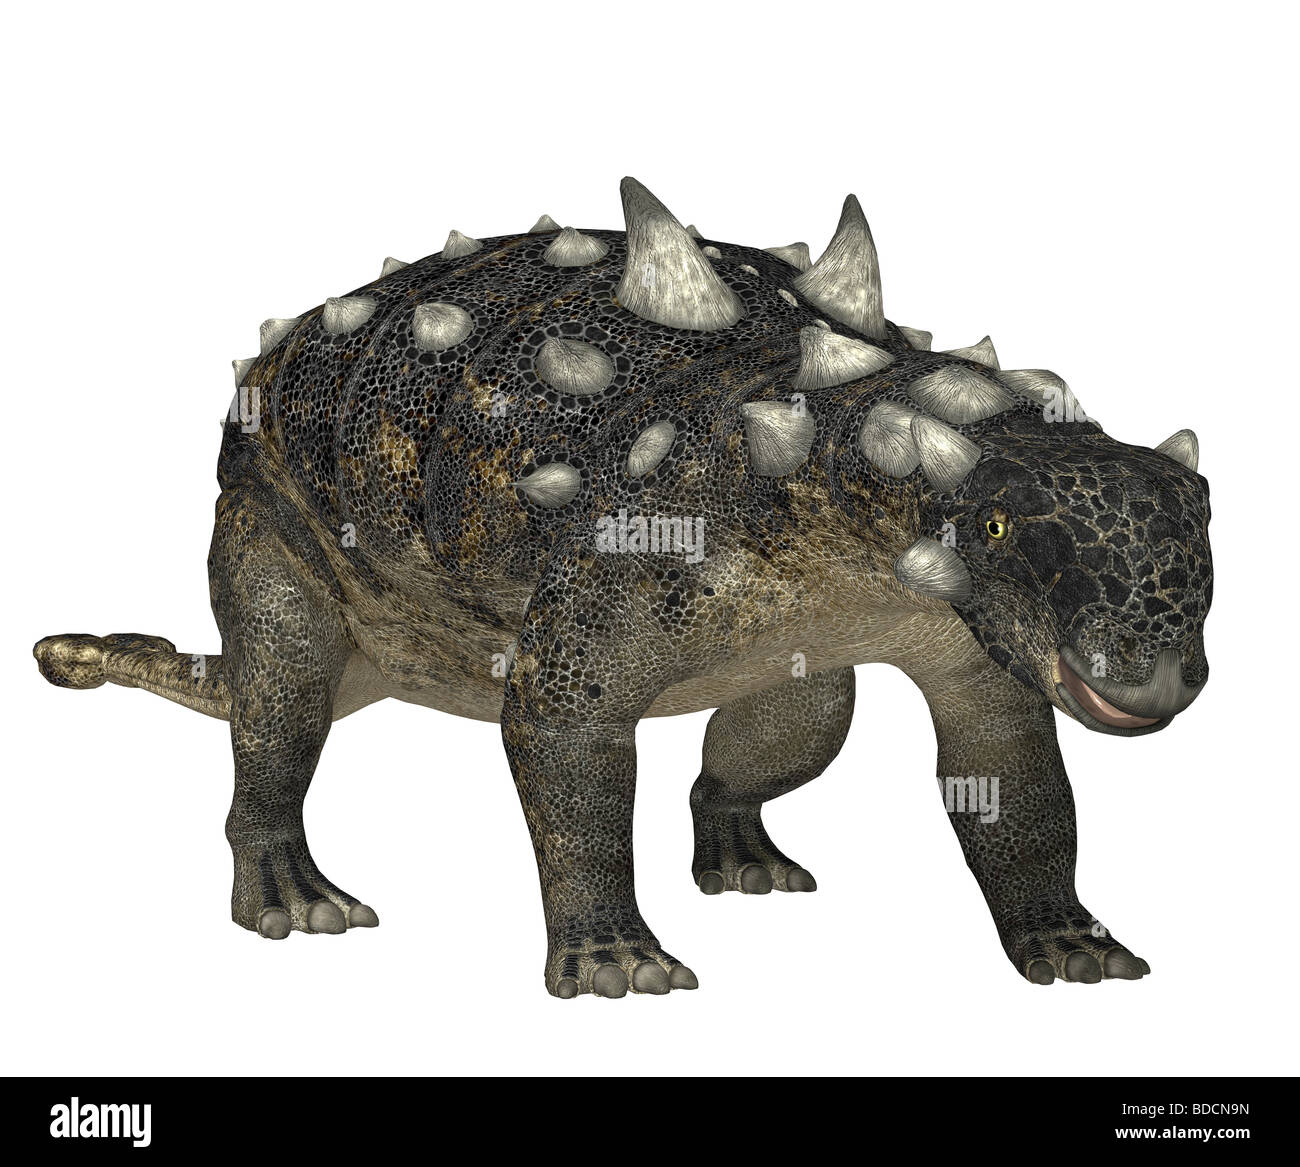 dinosaur euoplocephalus Stock Photo